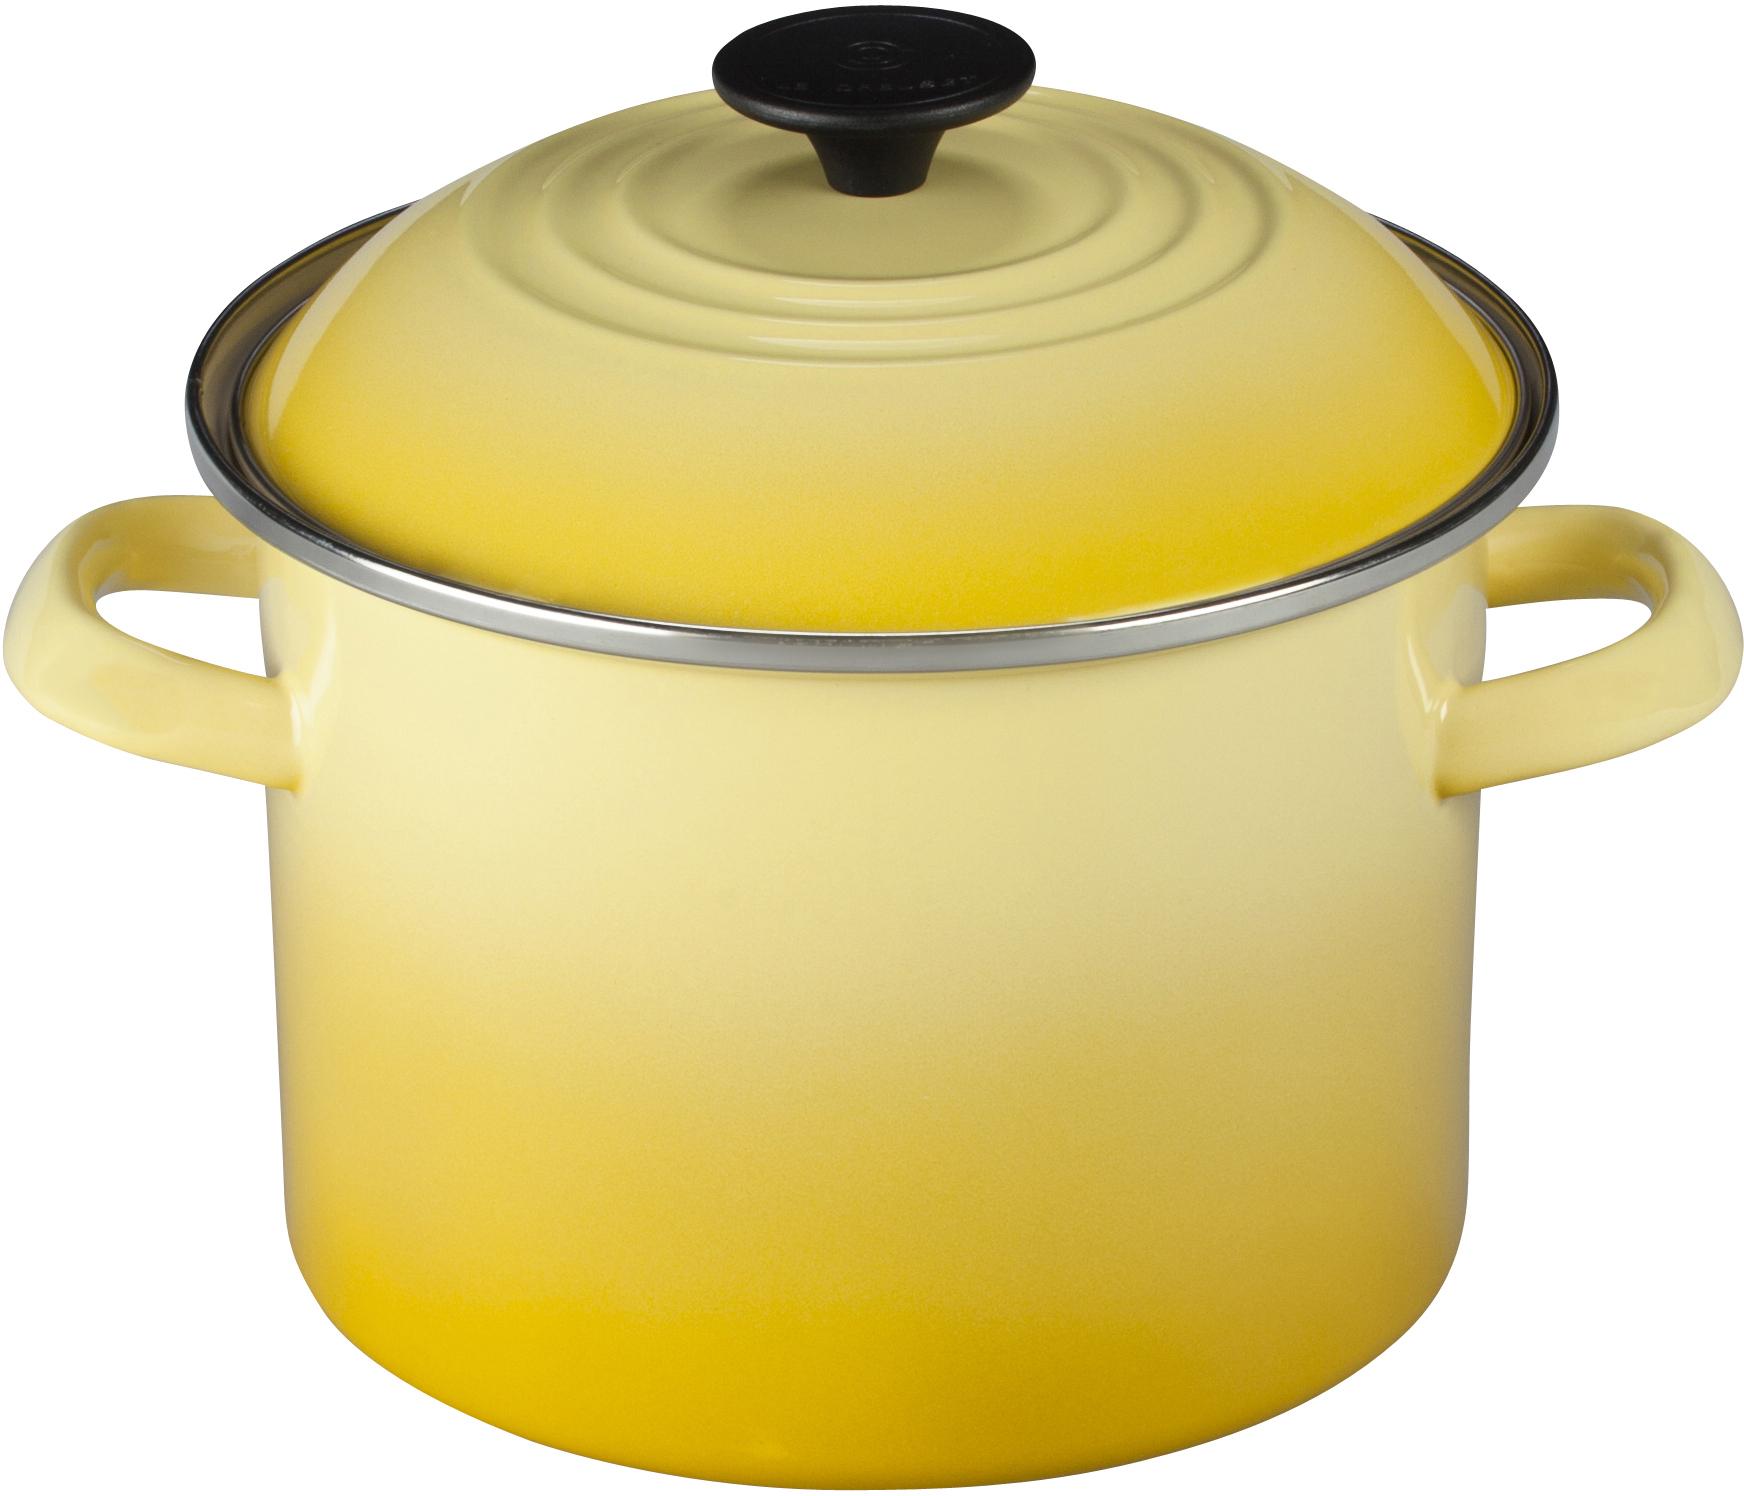 Le Creuset Soleil Yellow Enamel on Steel Stockpot, 6 Quart